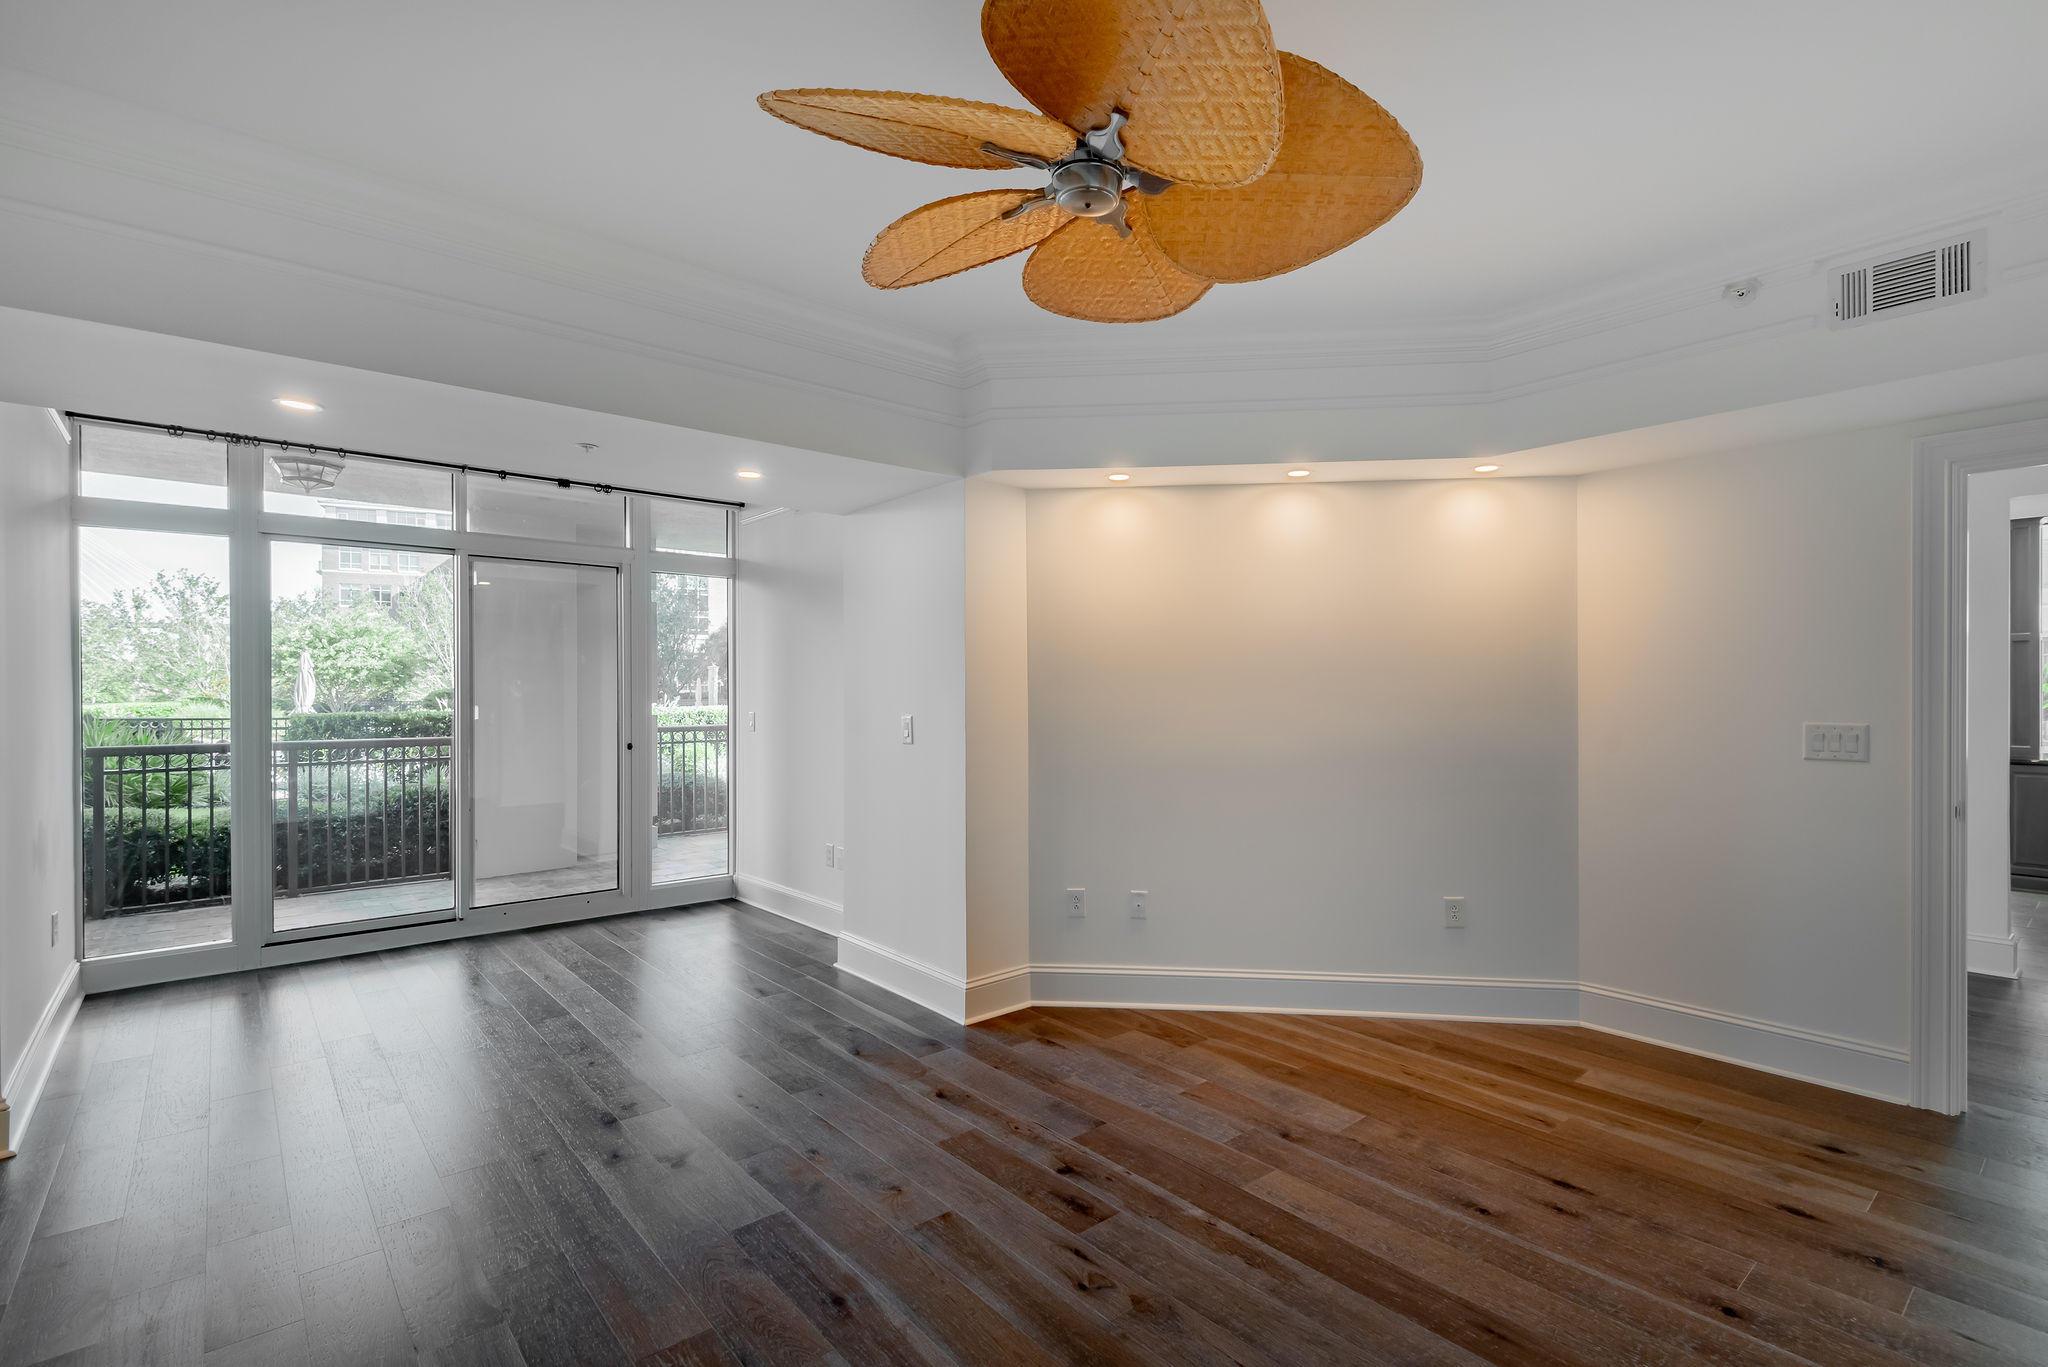 Renaissance On Chas Harbor Homes For Sale - 211 Plaza, Mount Pleasant, SC - 47